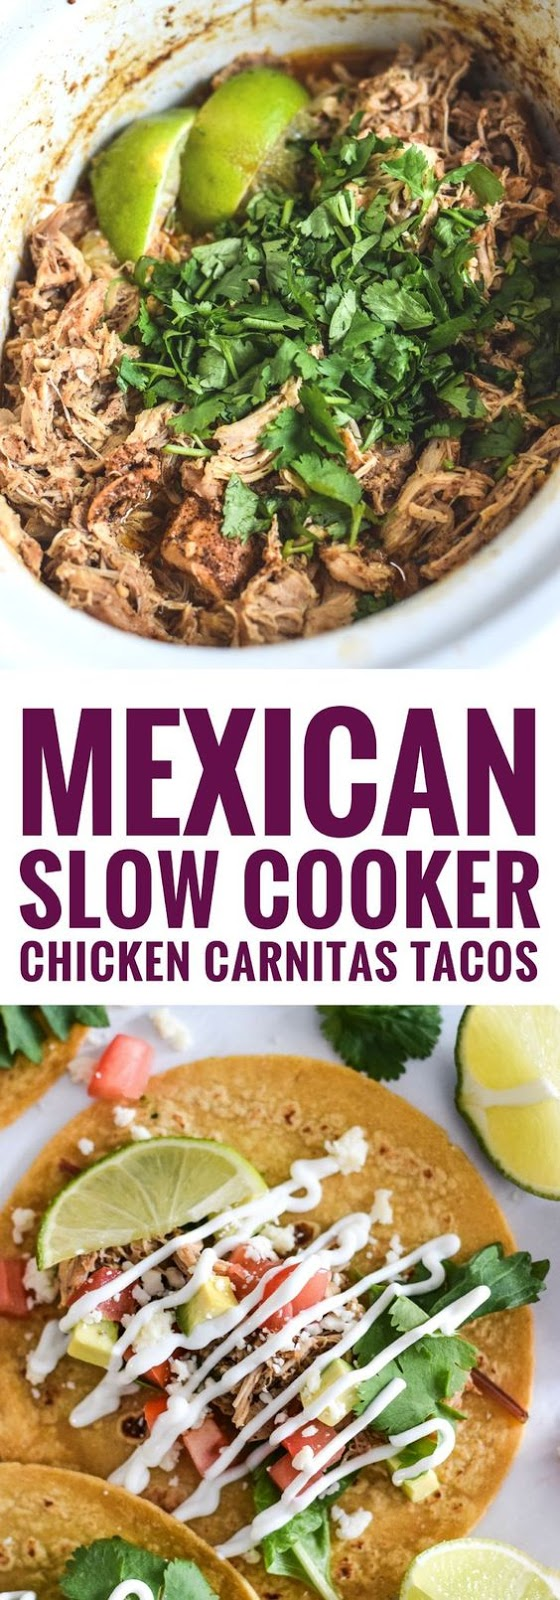 MEXICAN SLOW COOKER CHICKEN CARNITAS TACOS